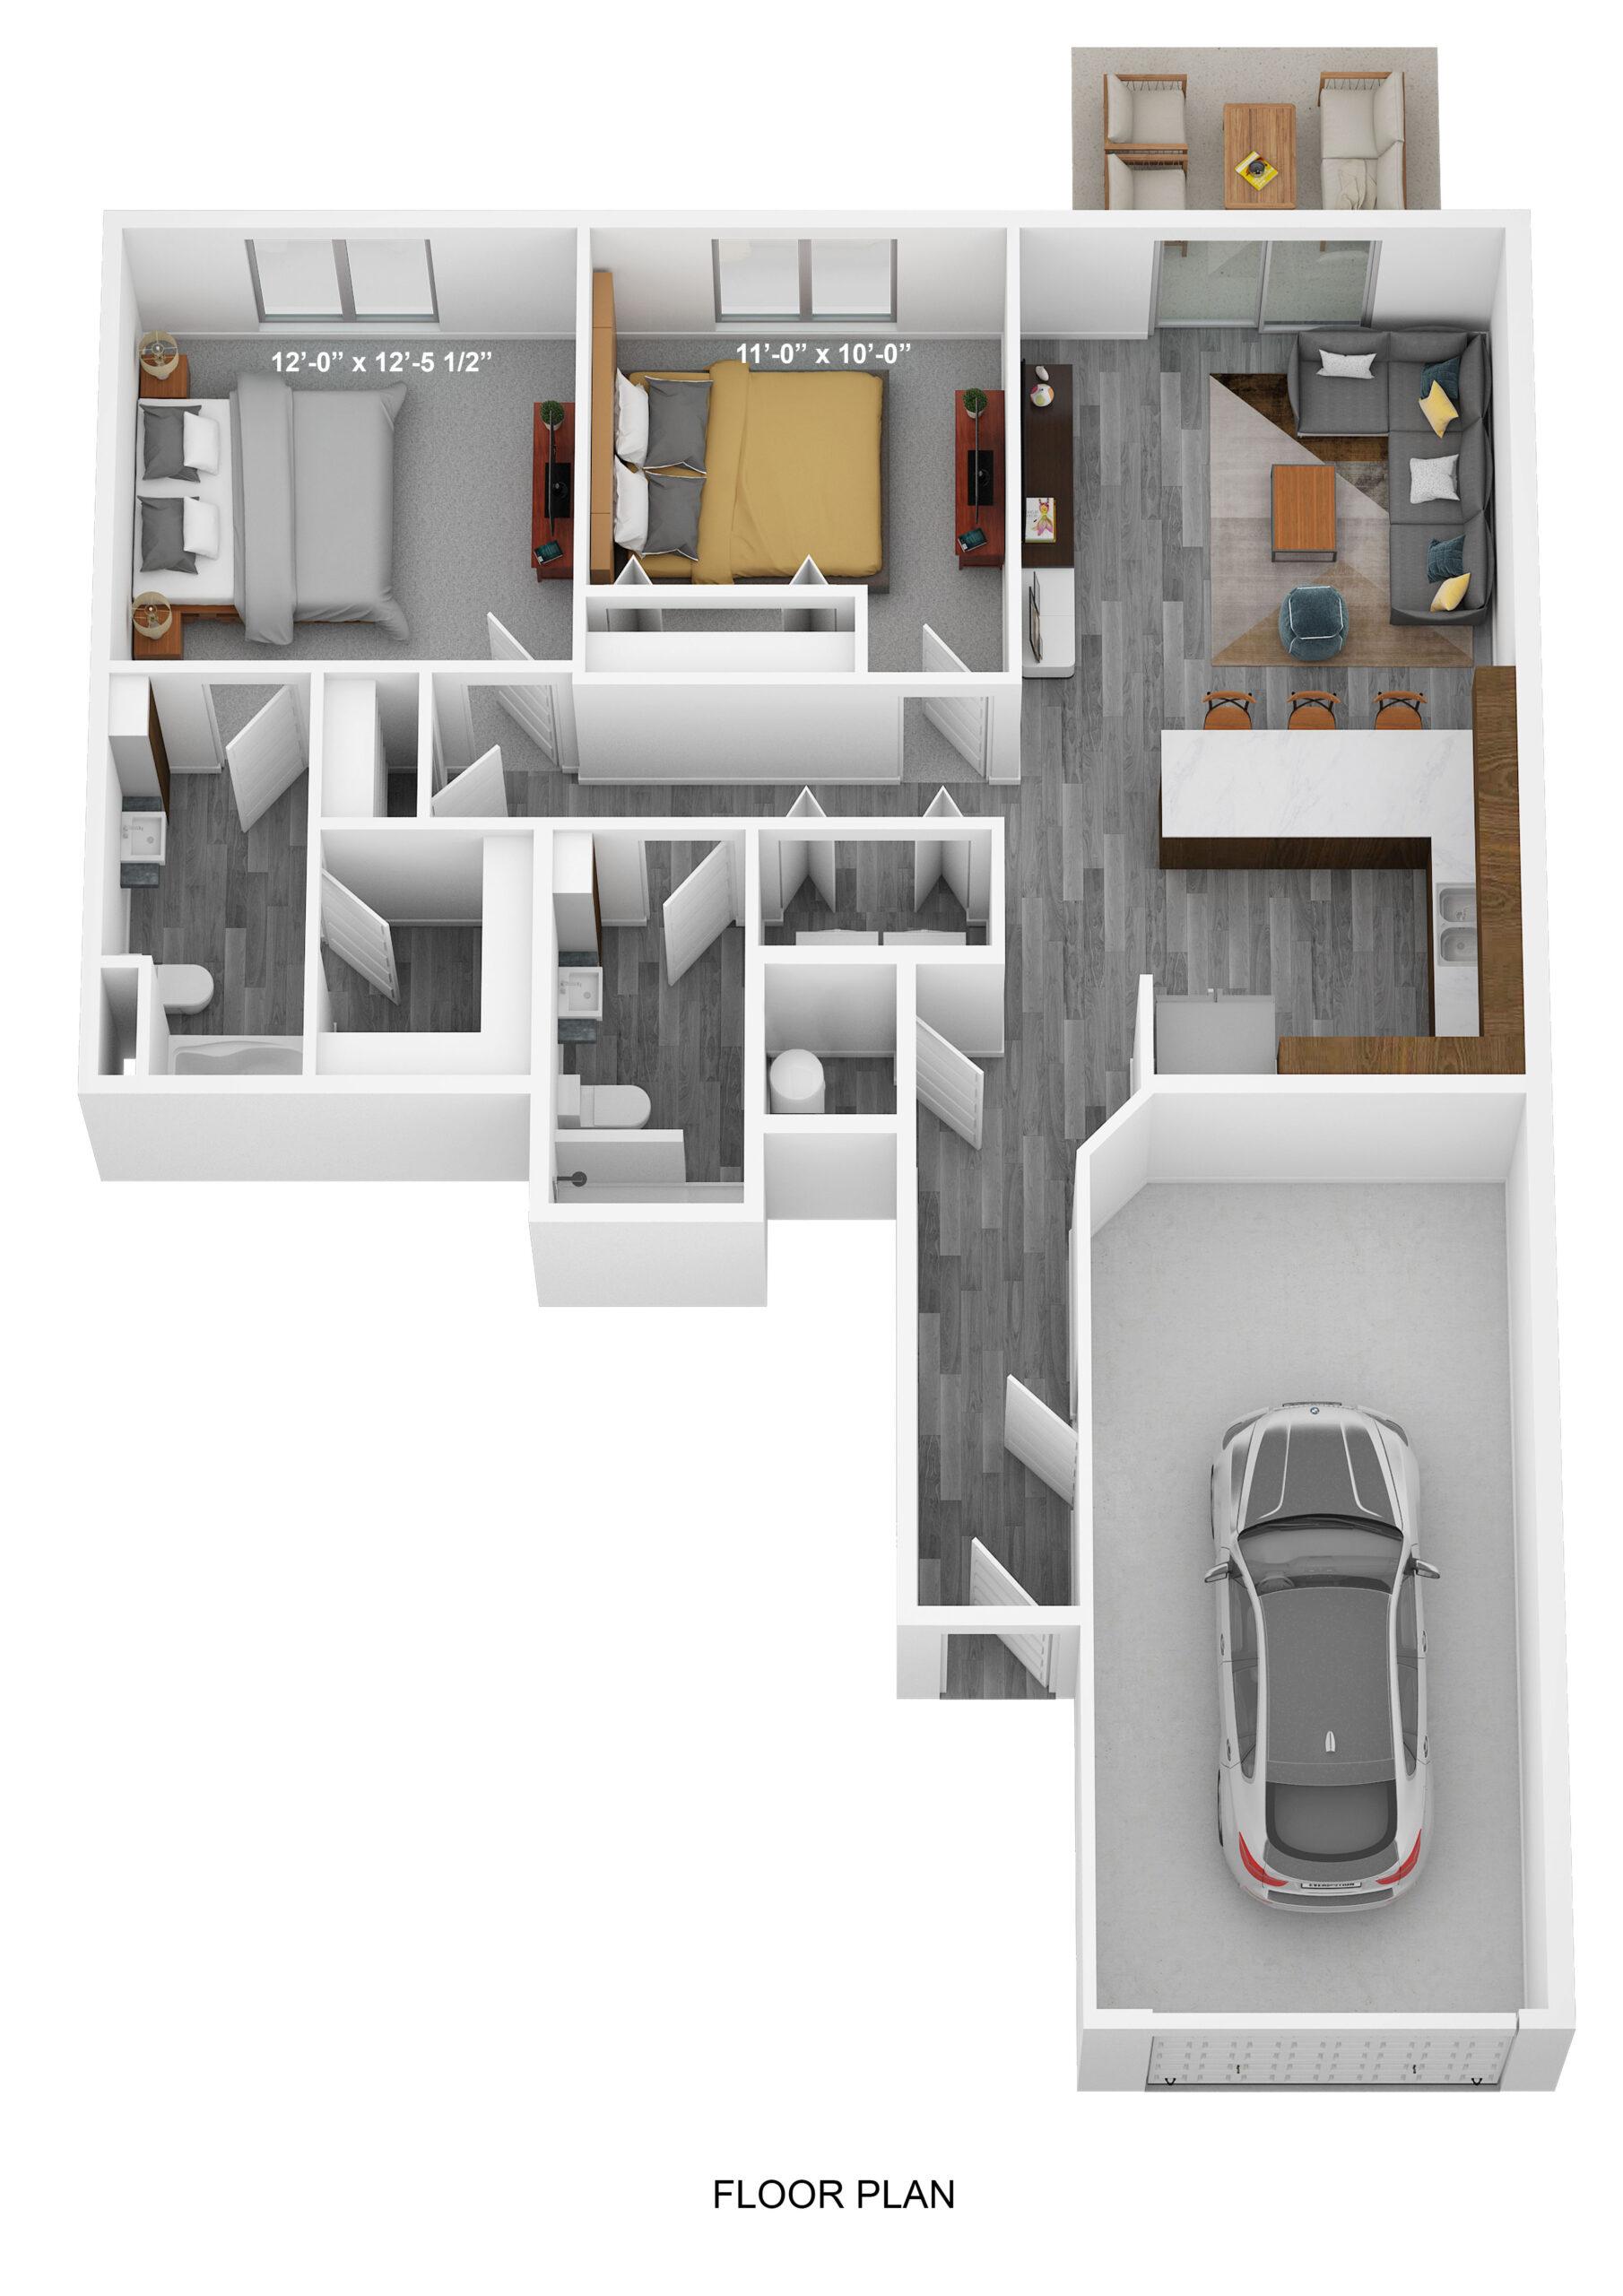 Two Bedroom Ground Level - Phase II